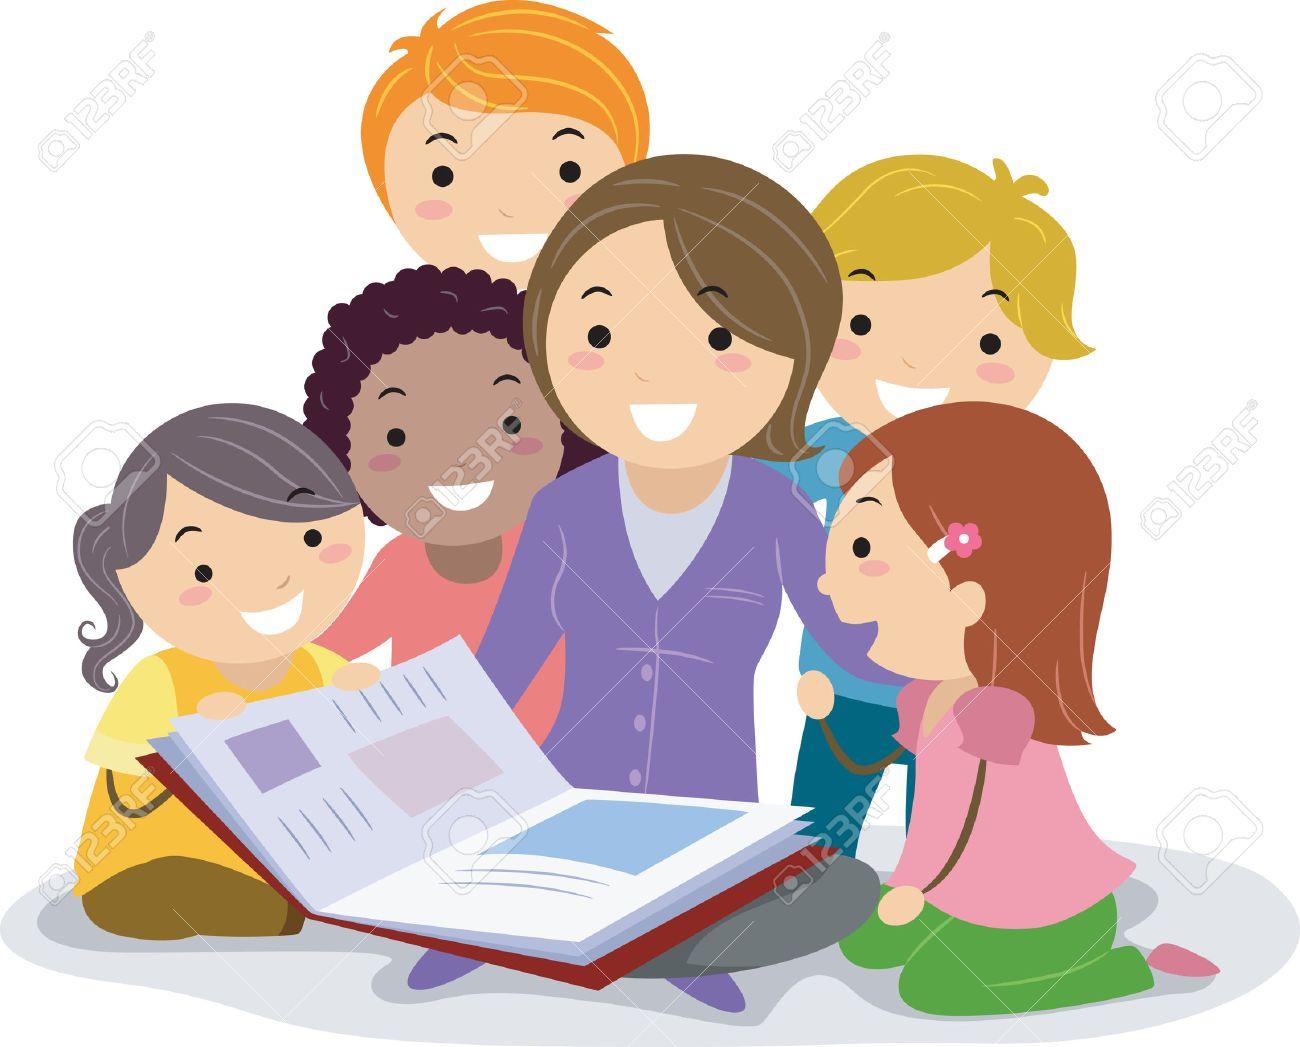 stickman illustration featuring kids huddled together while